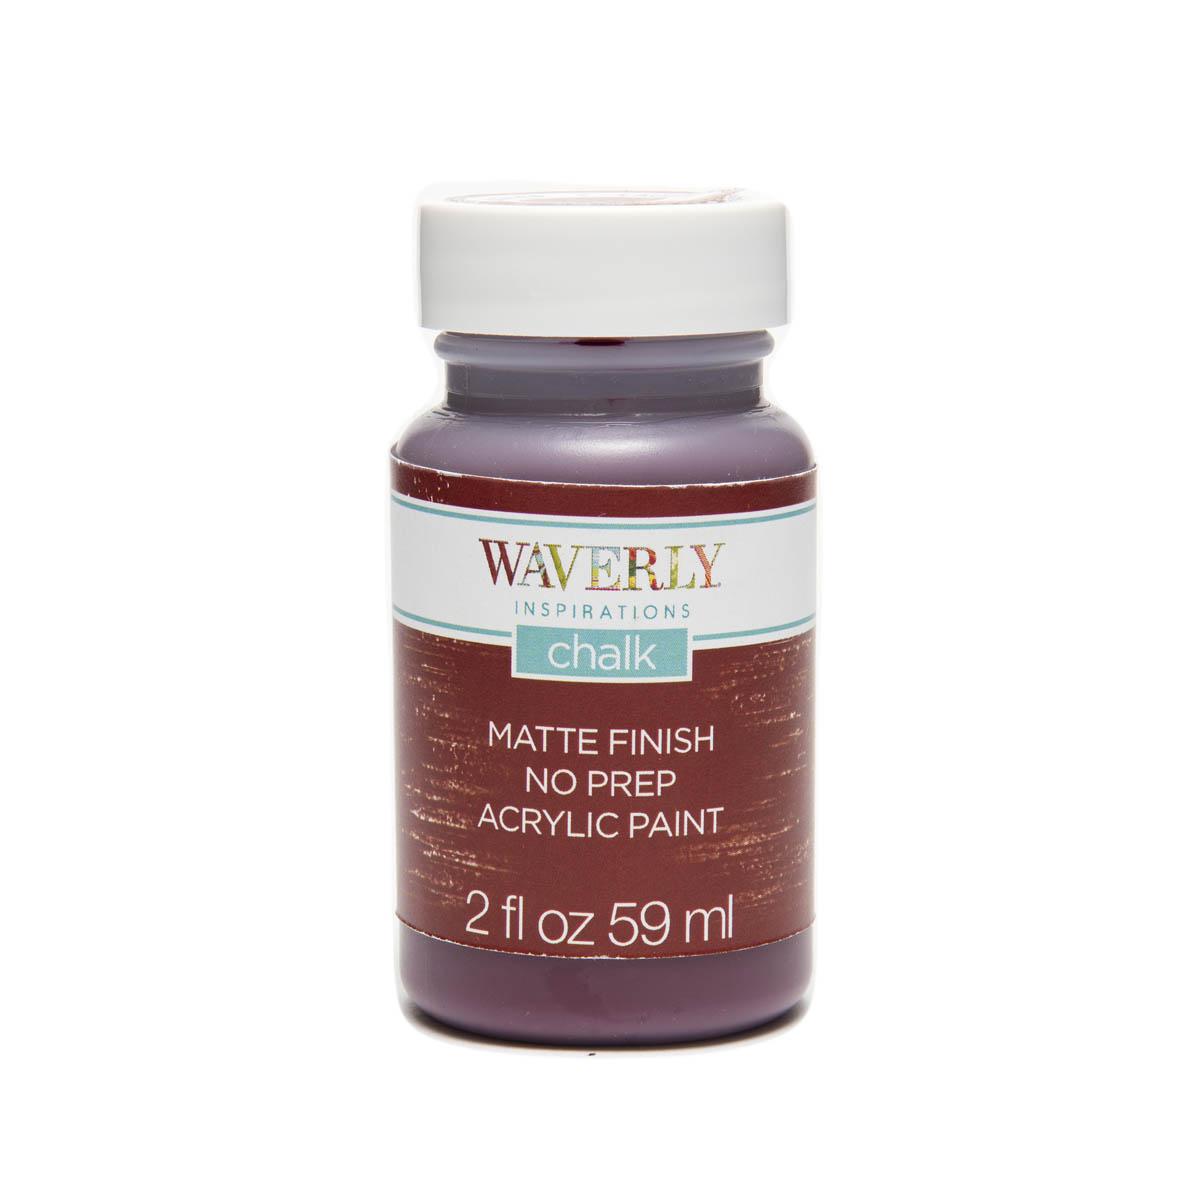 Waverly ® Inspirations Chalk Finish Acrylic Paint - Lacquer, 2 oz. - 60882E